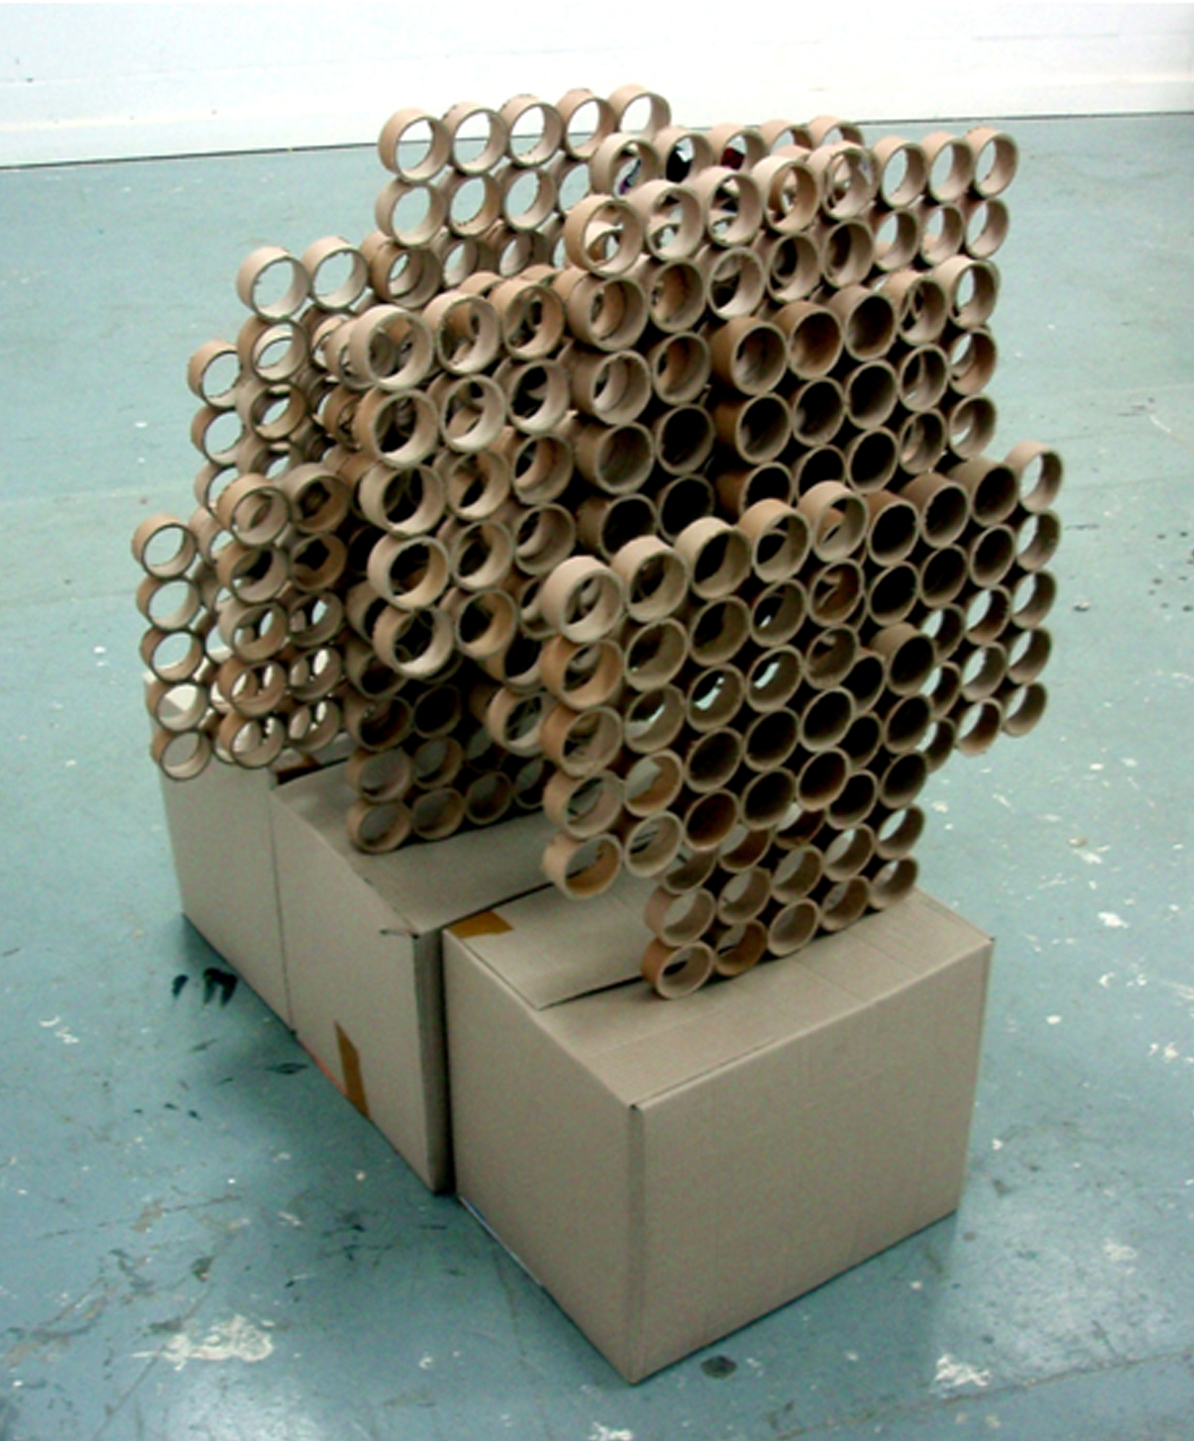 Reconfigured cardboard tubes (2007)